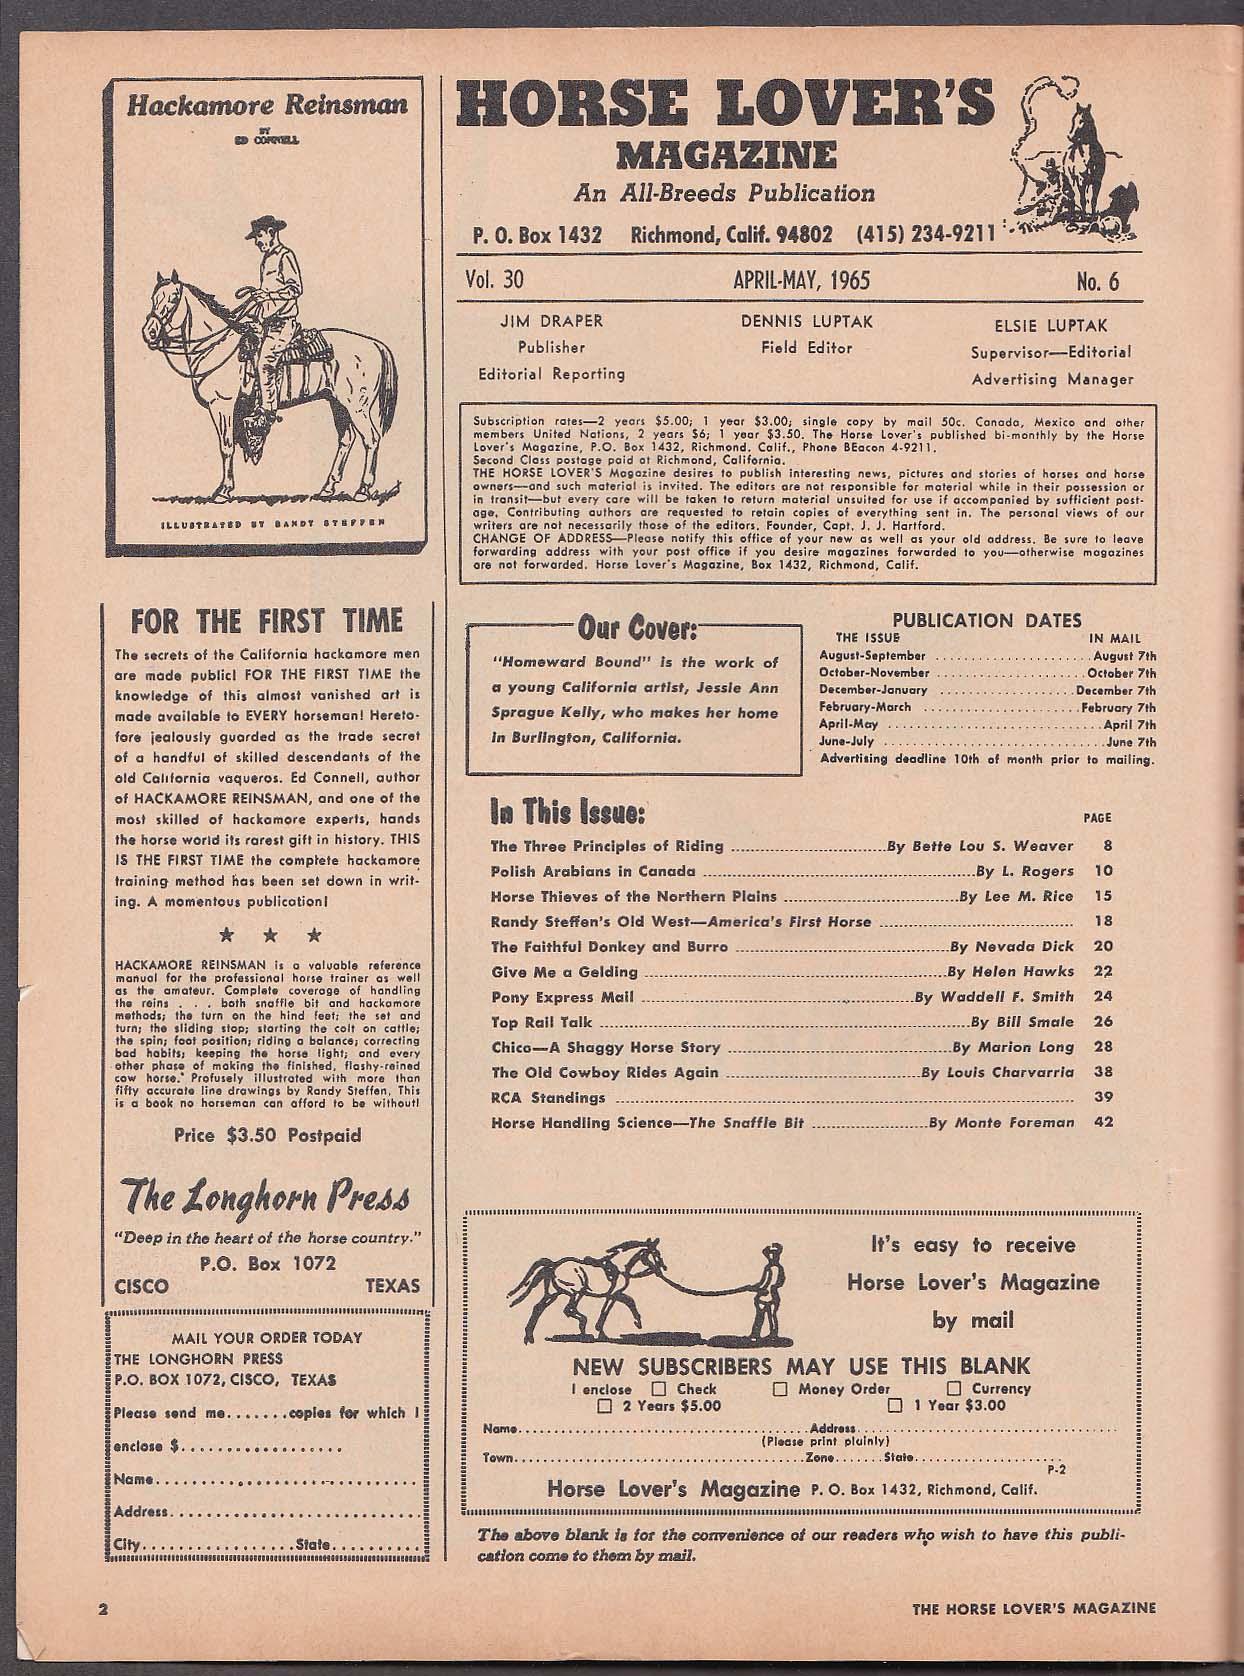 HORSE LOVER'S Polish Arabians in Canada Randy Steffen Chico ++ 4-5 1965